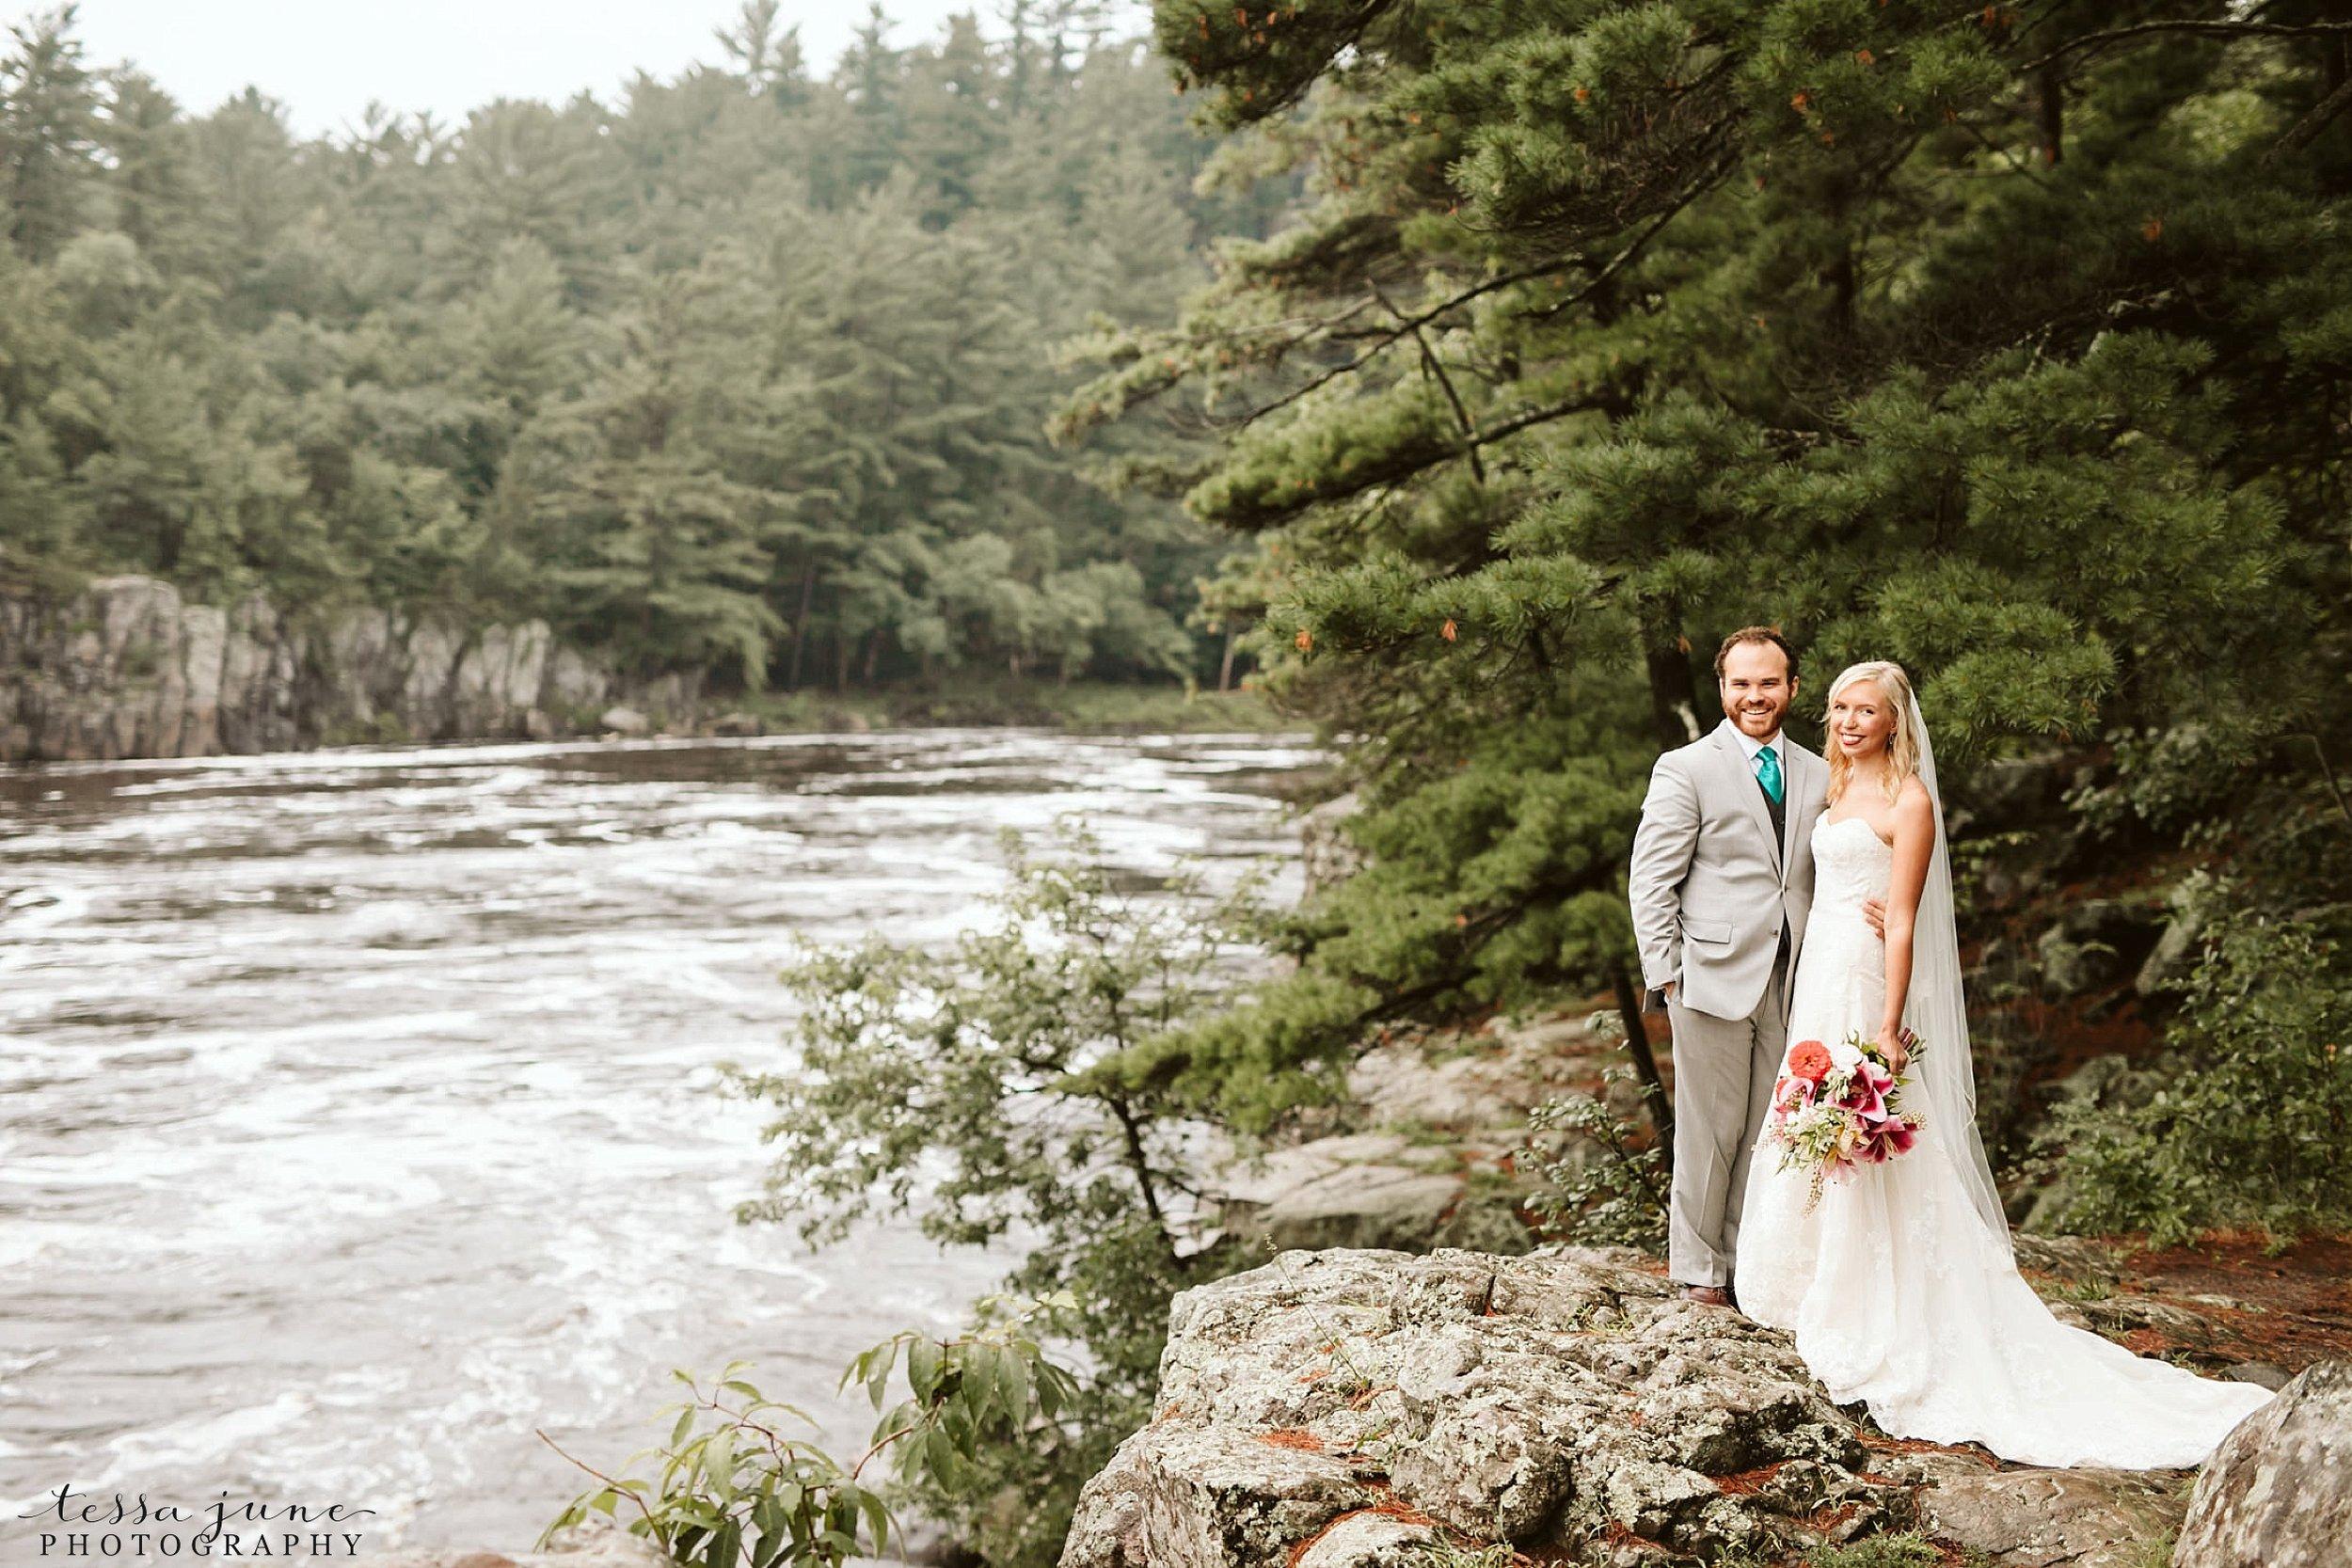 taylors-falls-rainy-elopement-wedding-interstate-state-park-1.jpg